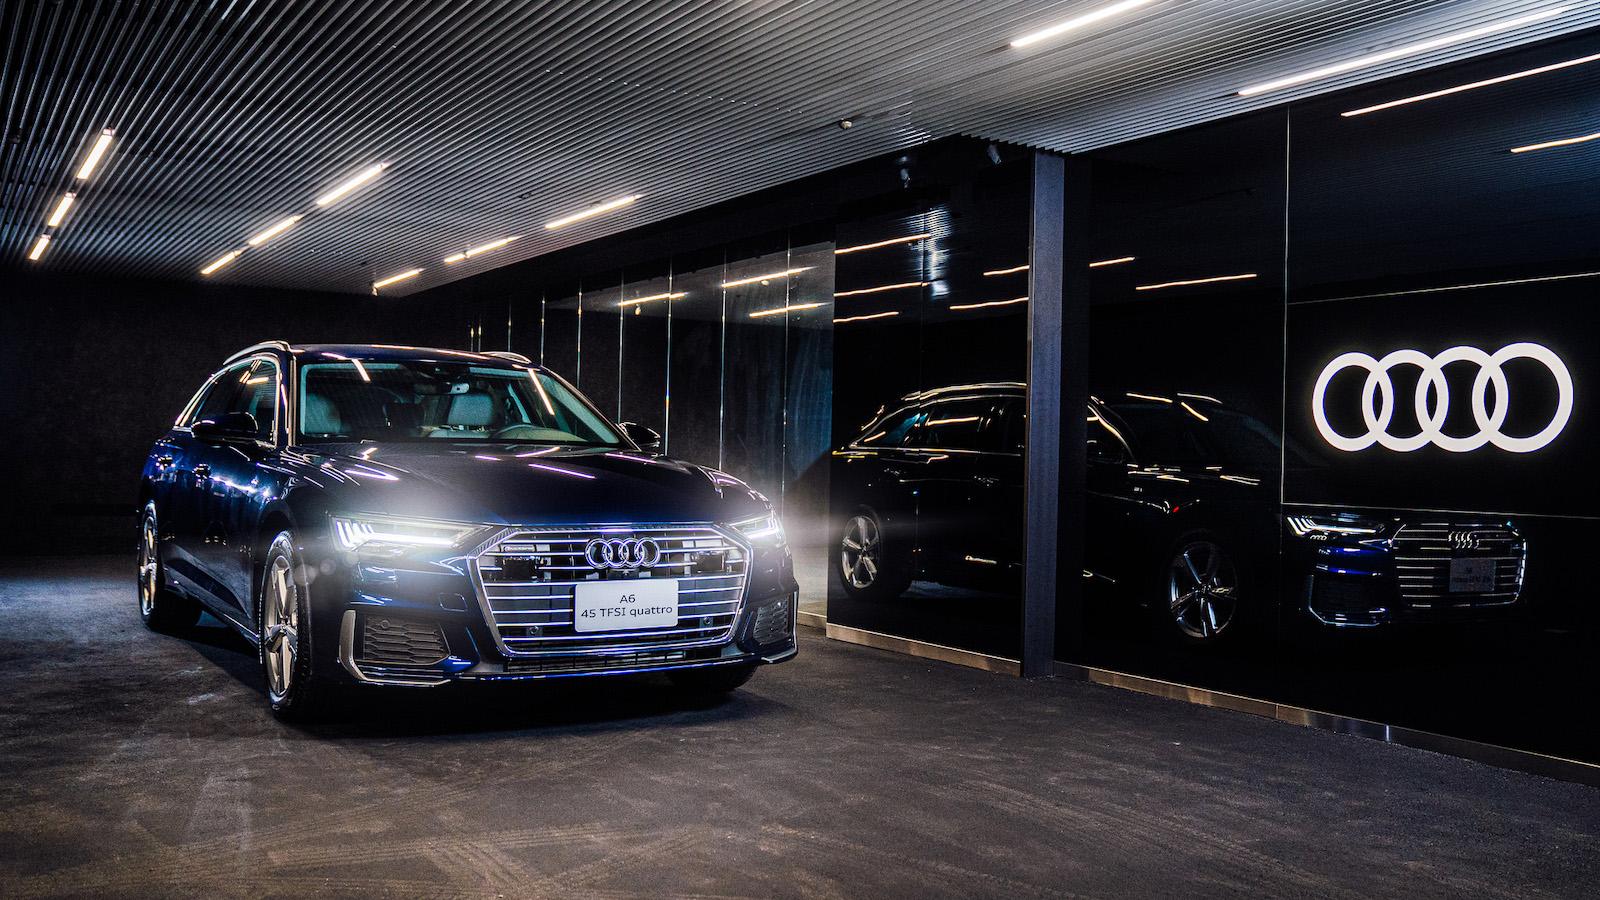 Audi 都市概念展間試營運開跑 年底前多項限量好禮